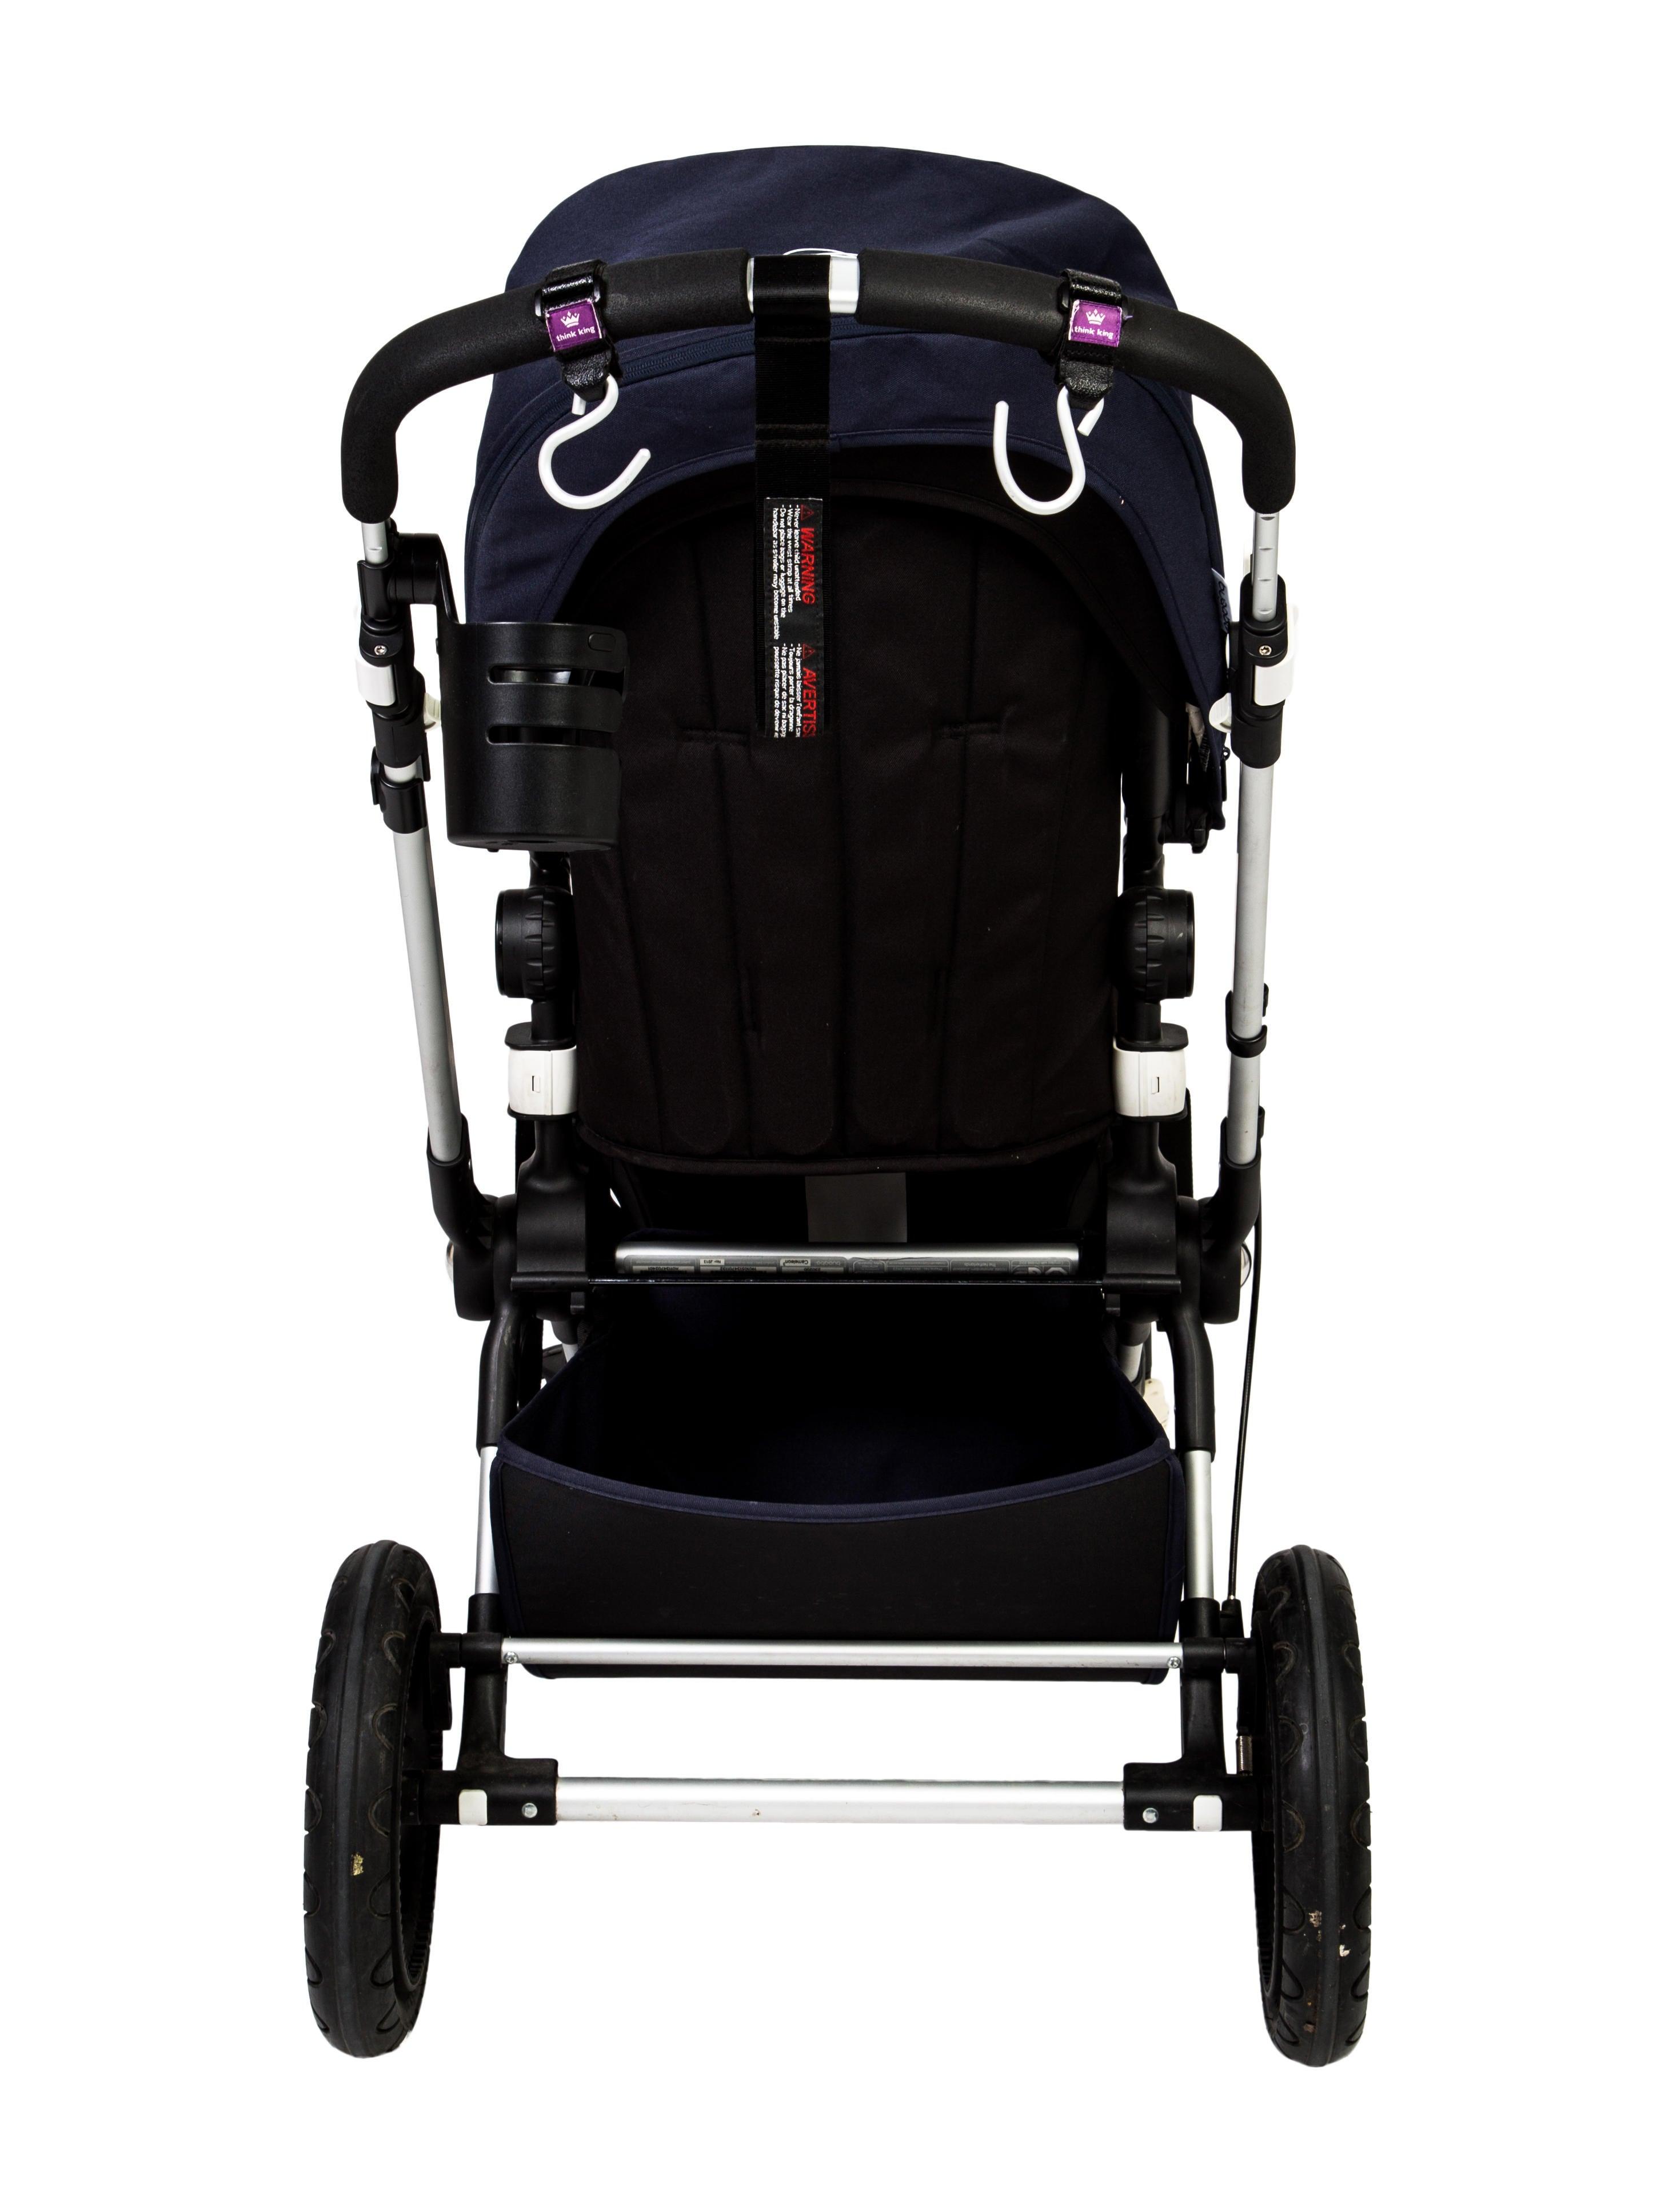 Bugaboo Cameleon 3 Stroller & Accessories - Kids Furniture ...